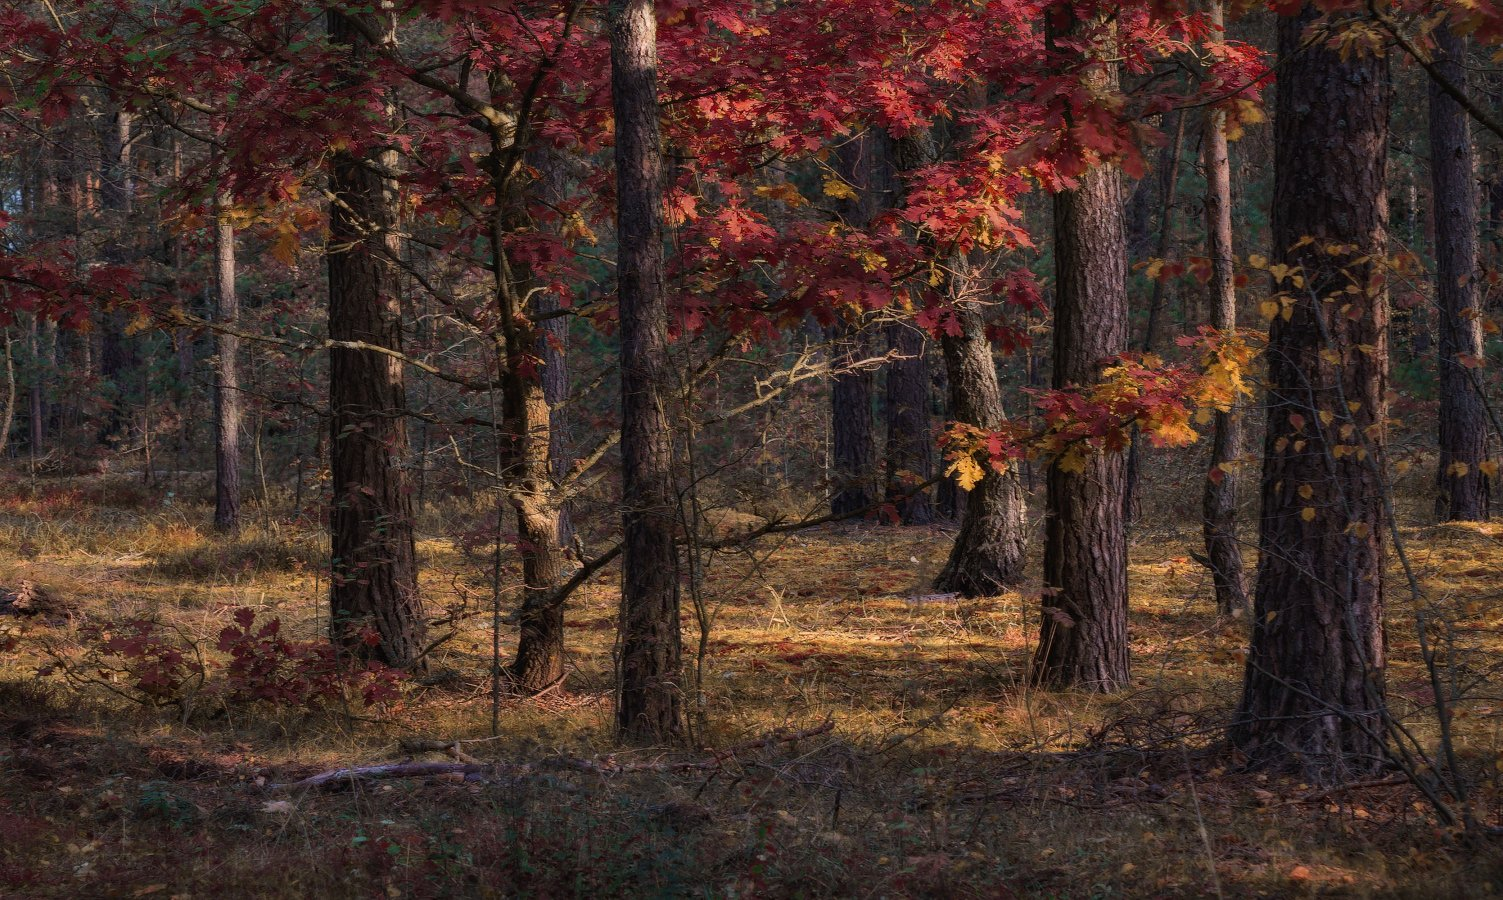 осень, утро,лес,, Сергей Шабуневич